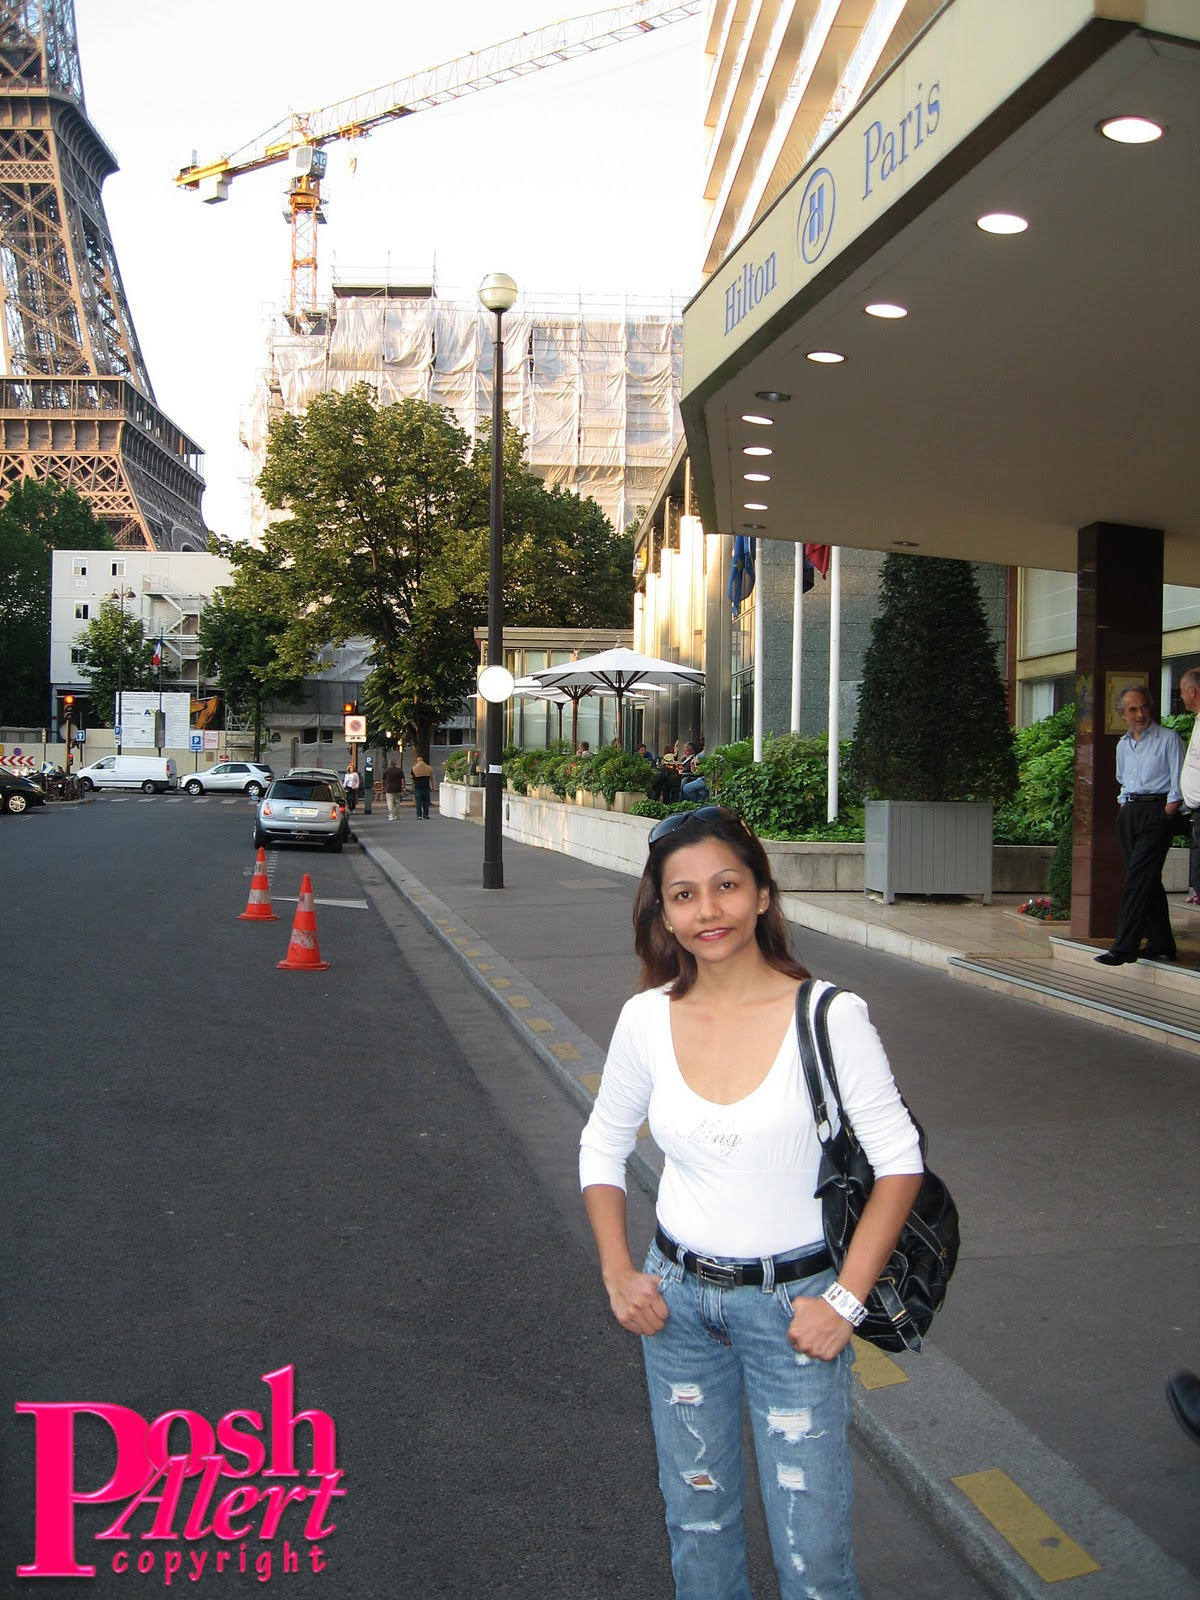 http://2.bp.blogspot.com/_yx_tu6ASO4o/TOkjUVb5TPI/AAAAAAAACHw/r6LR6jx_JFo/s1600/Paris057-poshalert.JPG